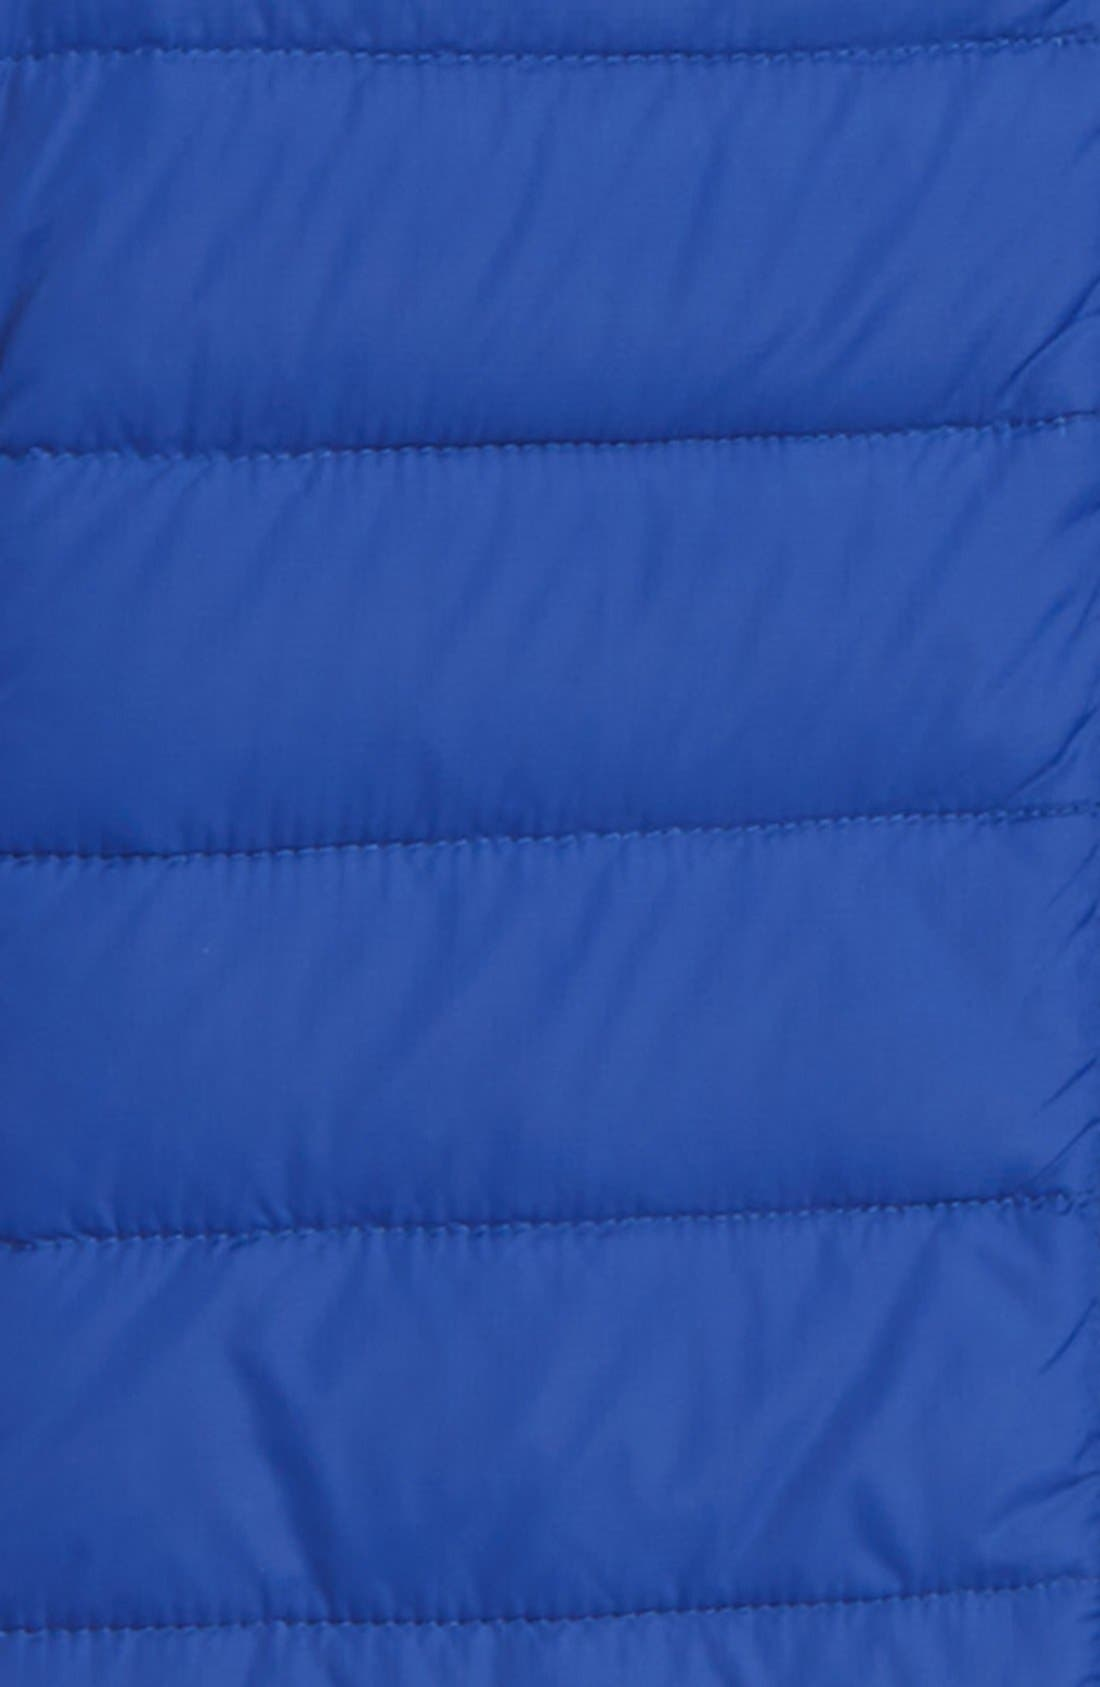 Alternate Image 2  - Canada Goose 'Bobcat' Packable Down Coat (Toddler & Little Kid)